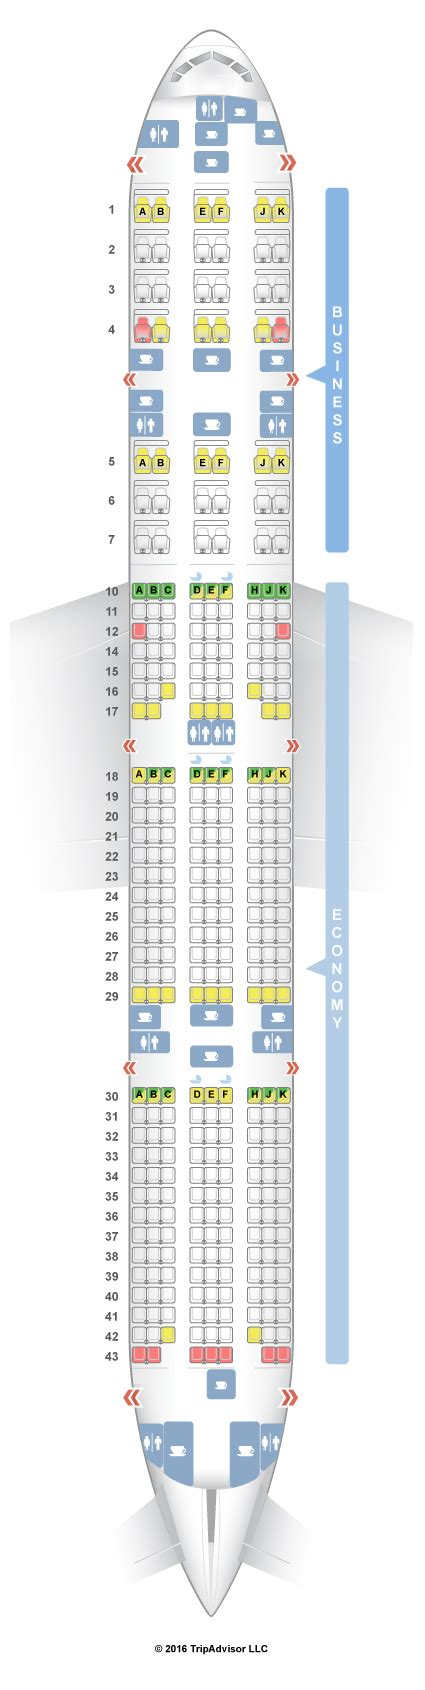 plan si鑒es boeing 777 300er seatguru seat map qatar airways boeing 777 300er 77w v3